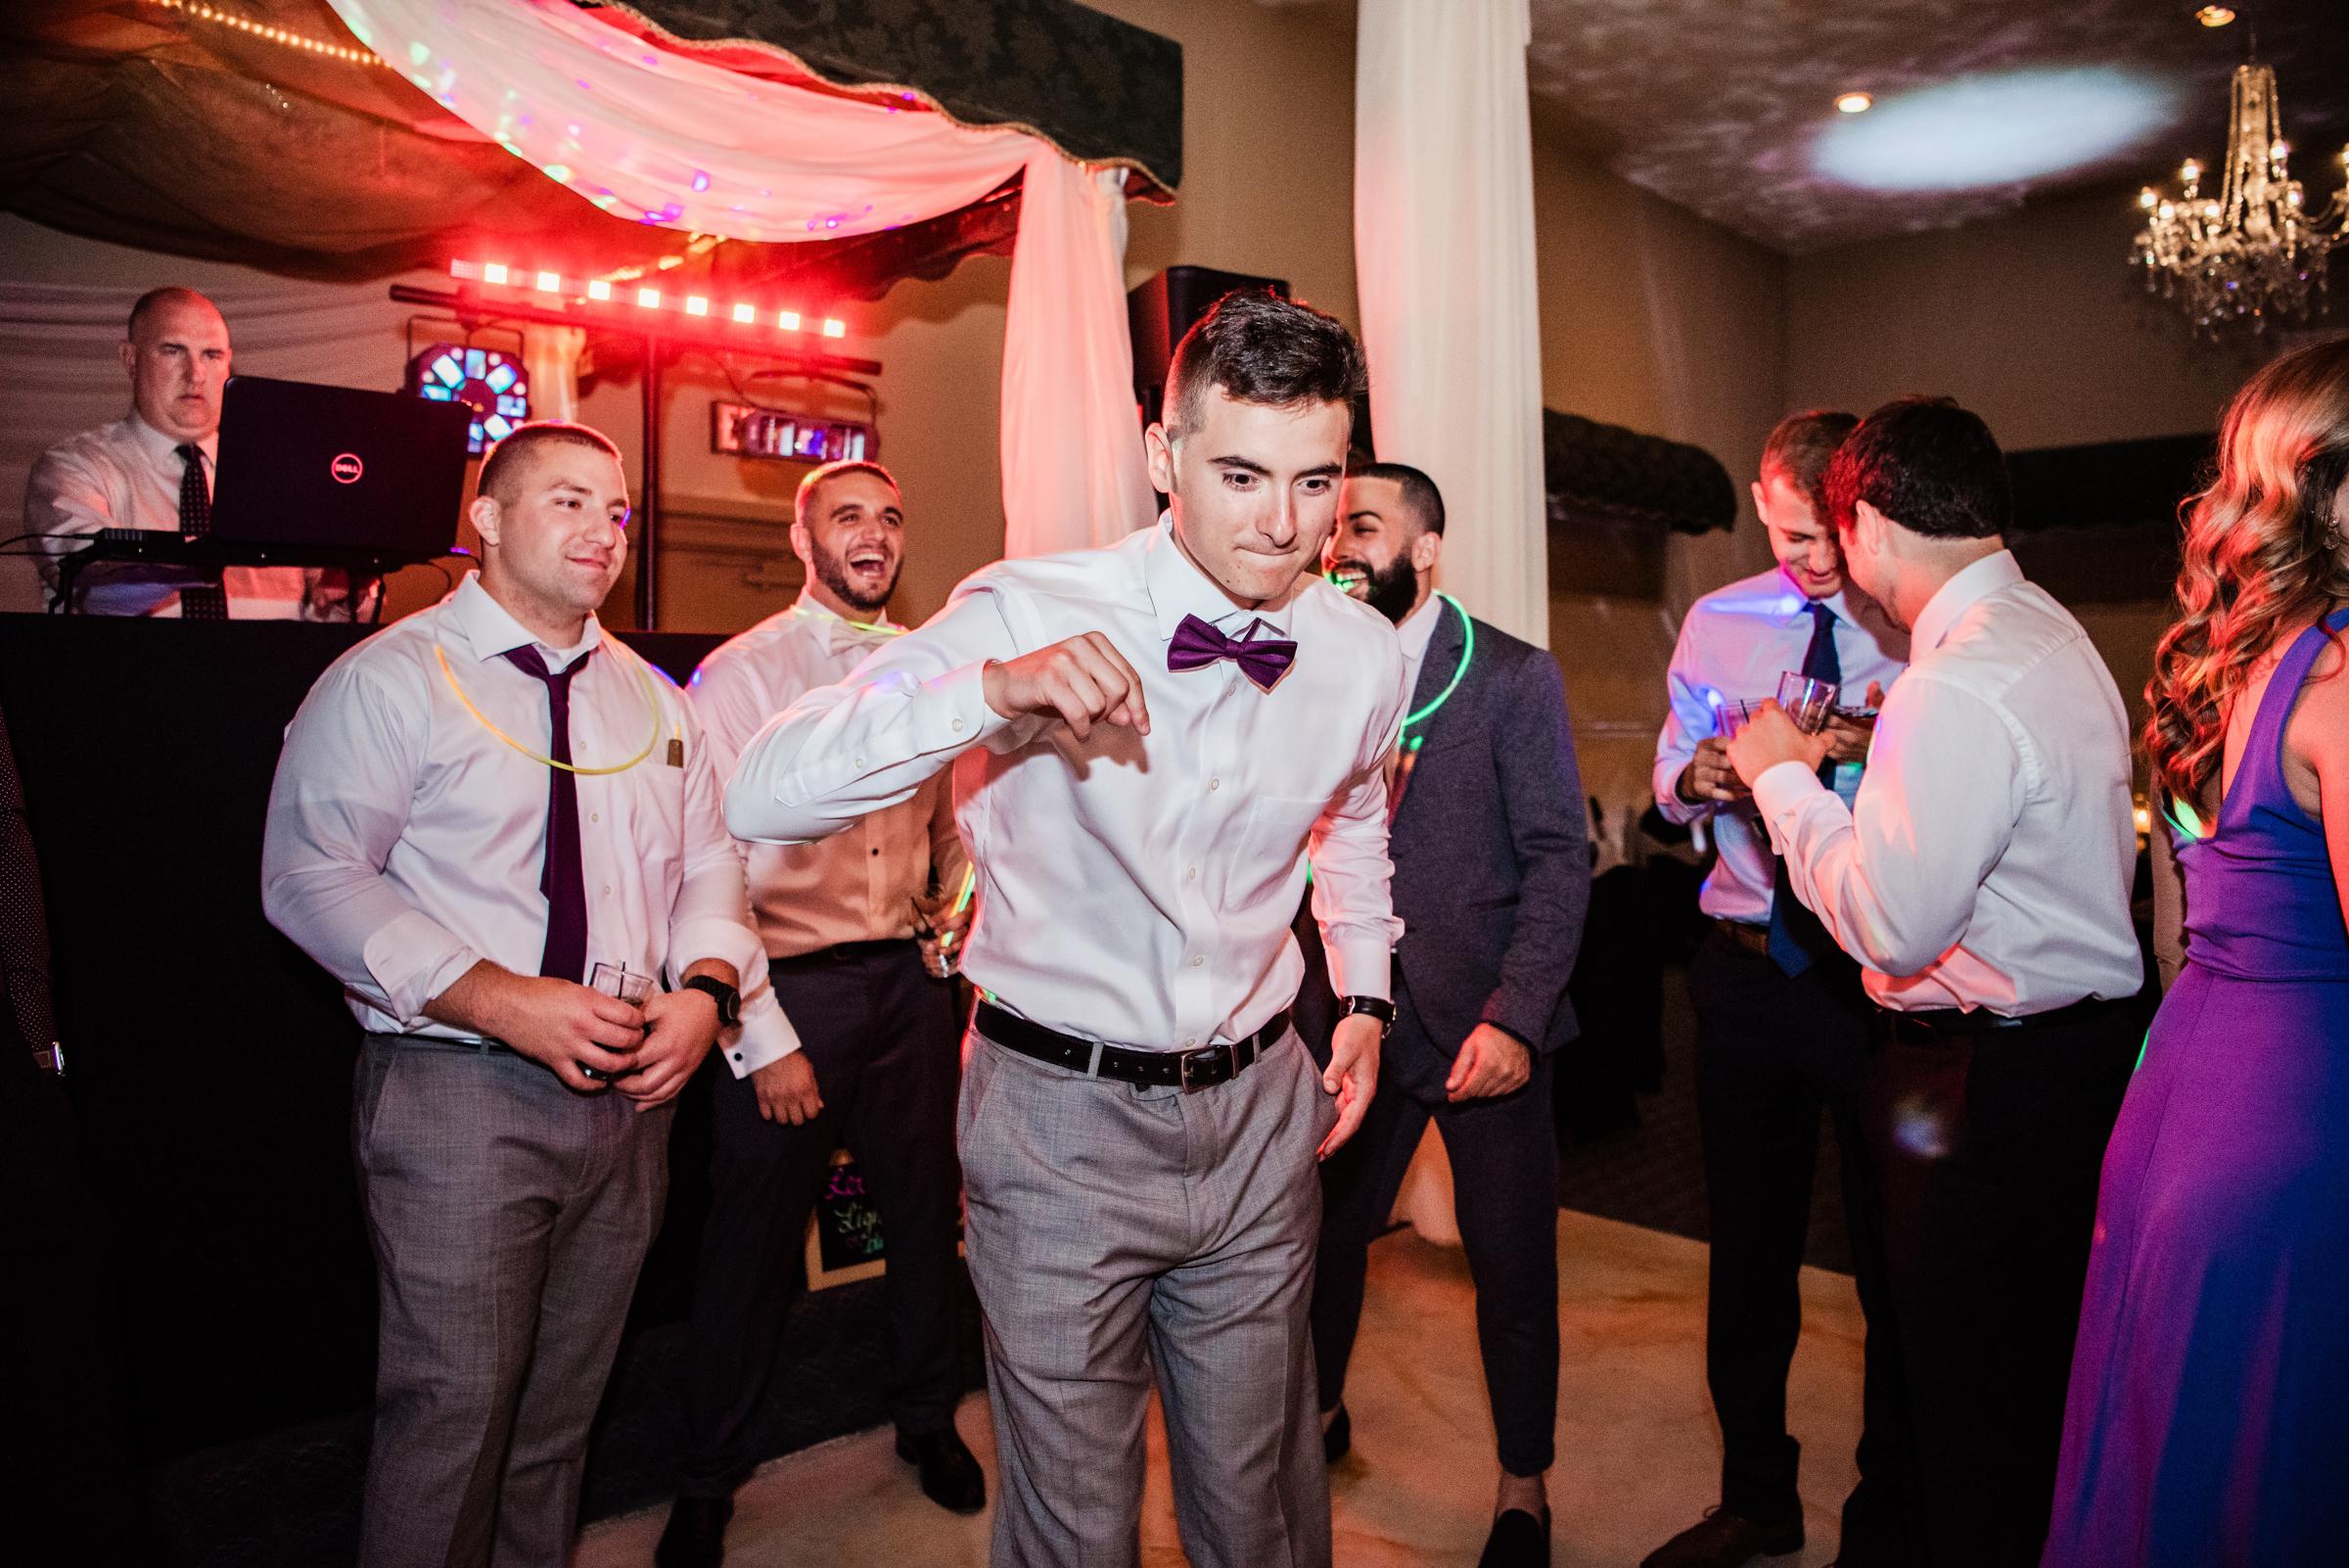 Historic_Old_St_Johns_Church_Valentinos_Banquet_Hall_Central_NY_Wedding_JILL_STUDIO_Rochester_NY_Photographer_DSC_7102.jpg